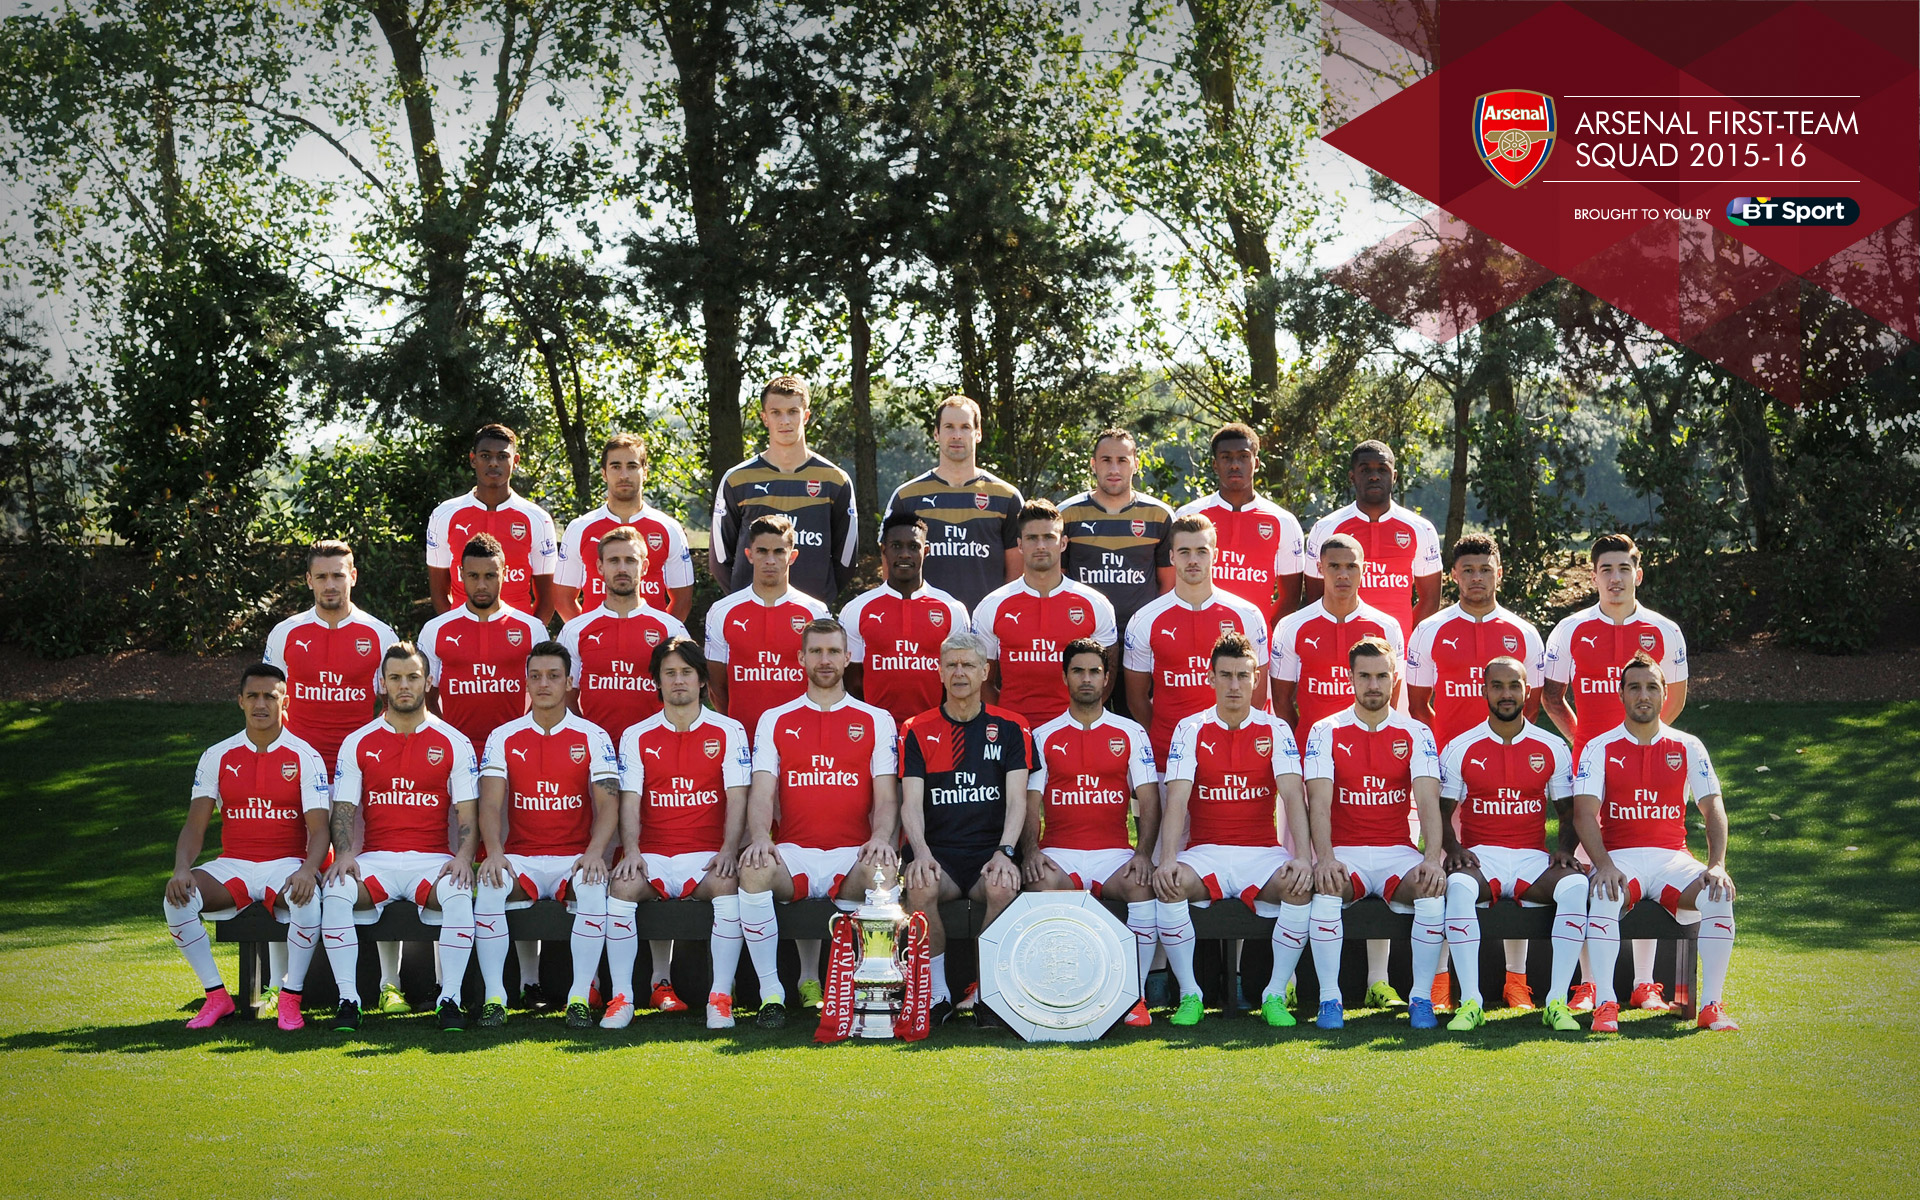 Mesut Ozil Wallpapers Hd Arsenal Arsenal Wallpapers Hd 2018 Pixelstalk Net